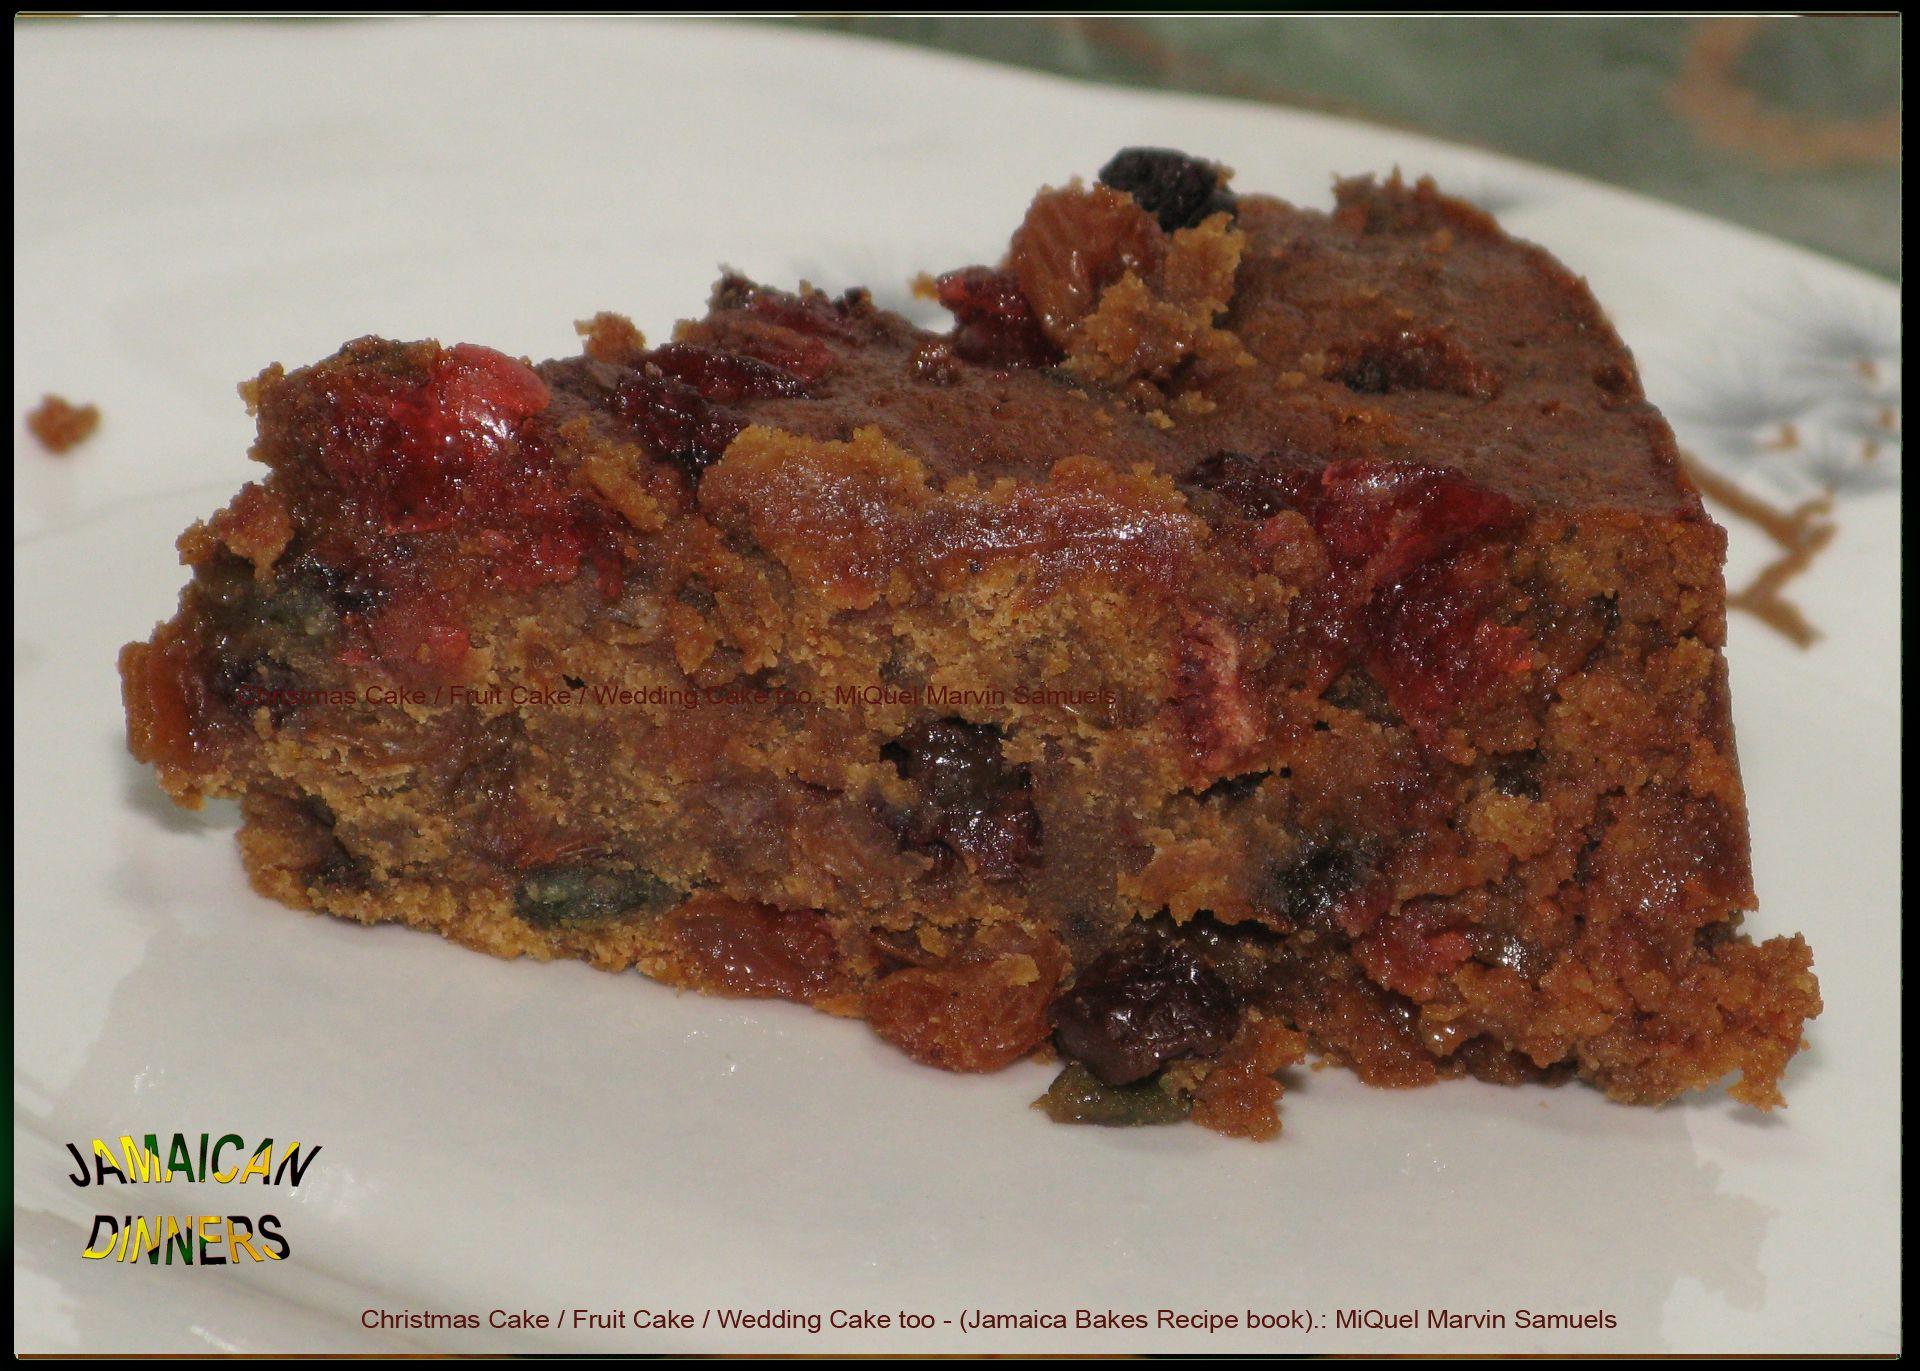 Christmas cake fruit cake wedding cake too jamaica bakes christmas cake fruit cake wedding cake too jamaica bakes recipe bookmiquel marvin samuels forumfinder Images